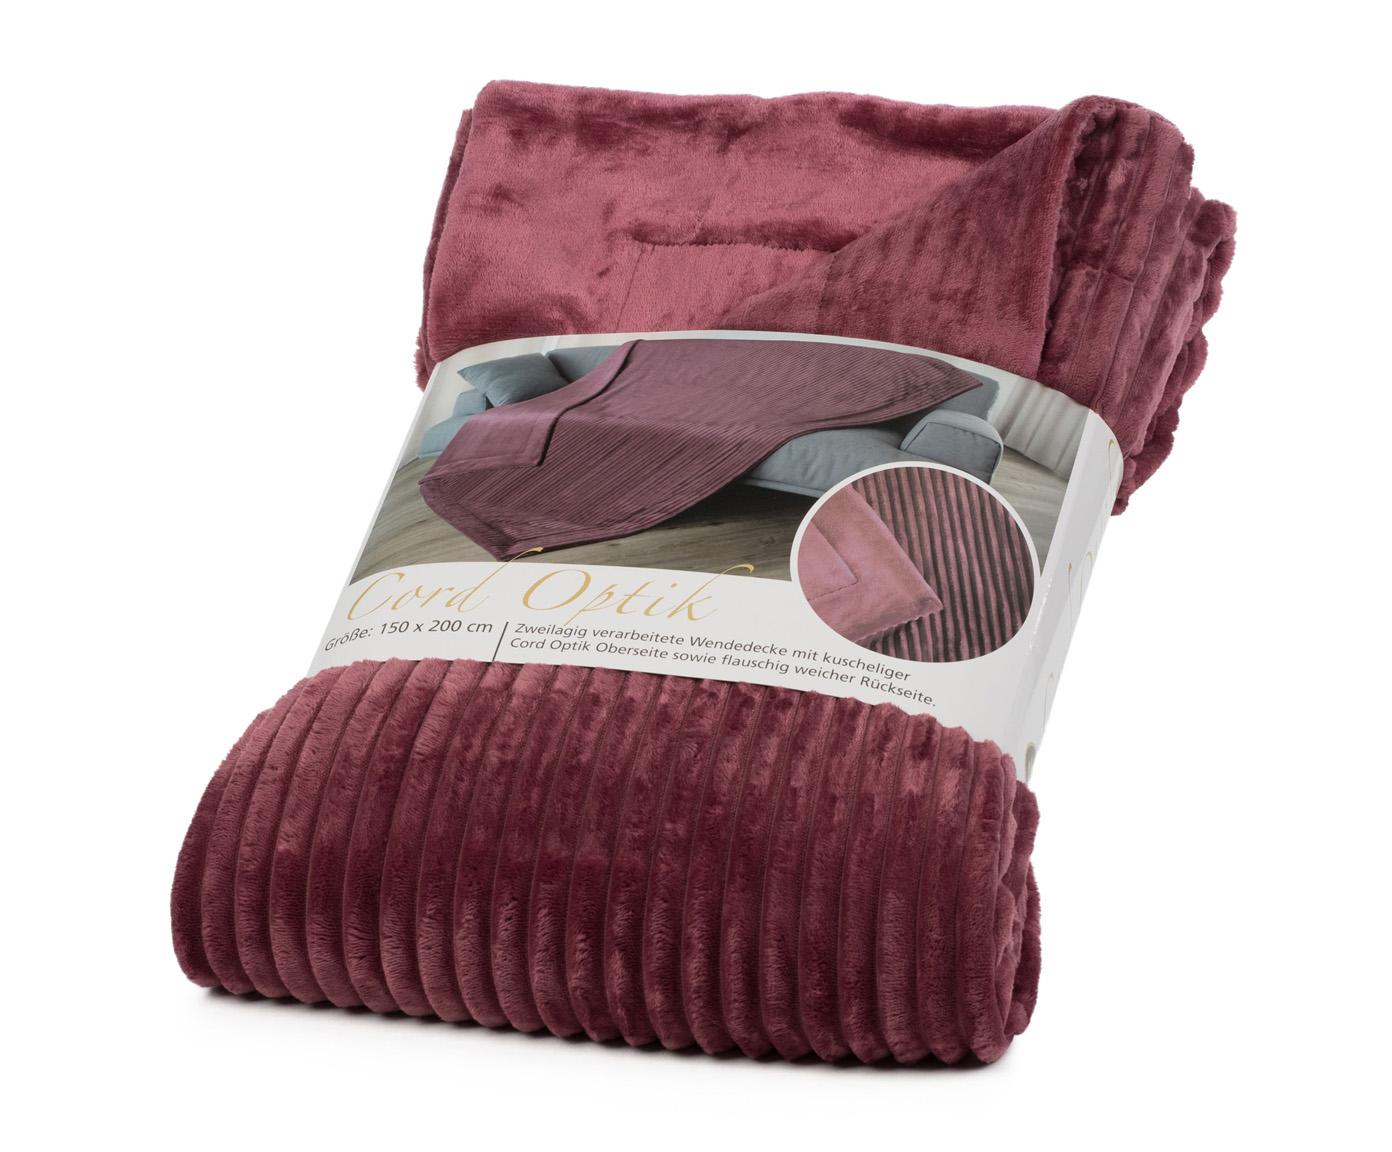 Blankets Cord Optik 150x200 berry